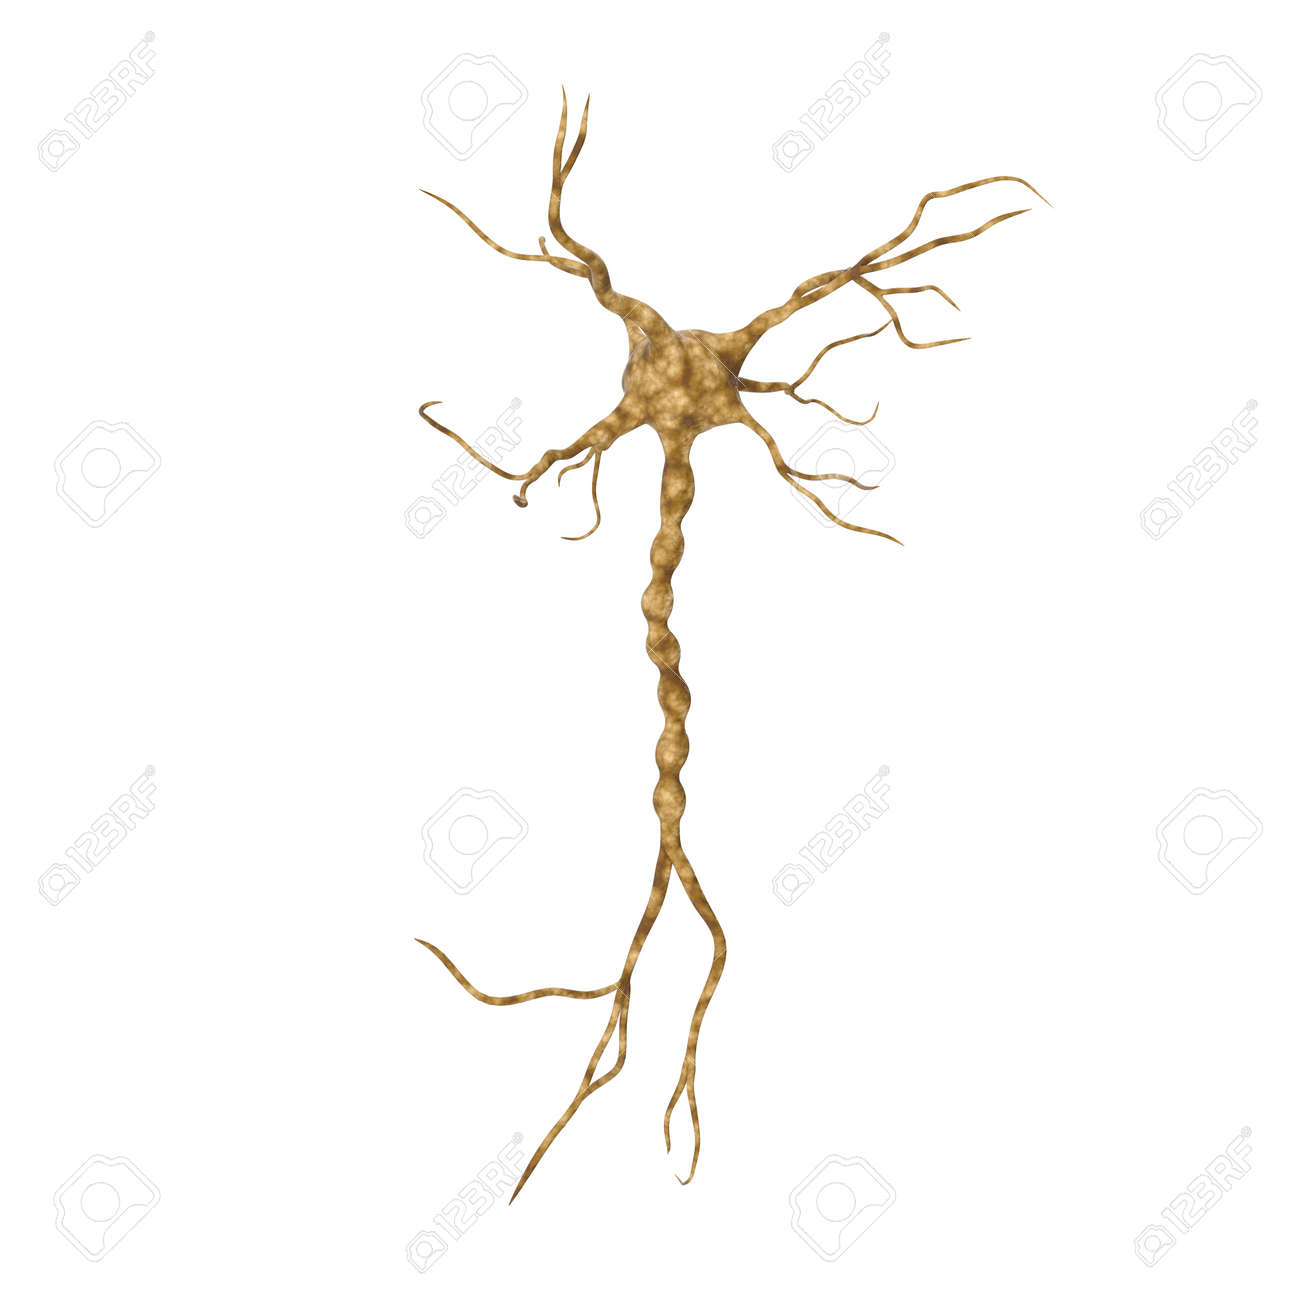 hight resolution of illustration single neuron nervous system on white 3d illustration